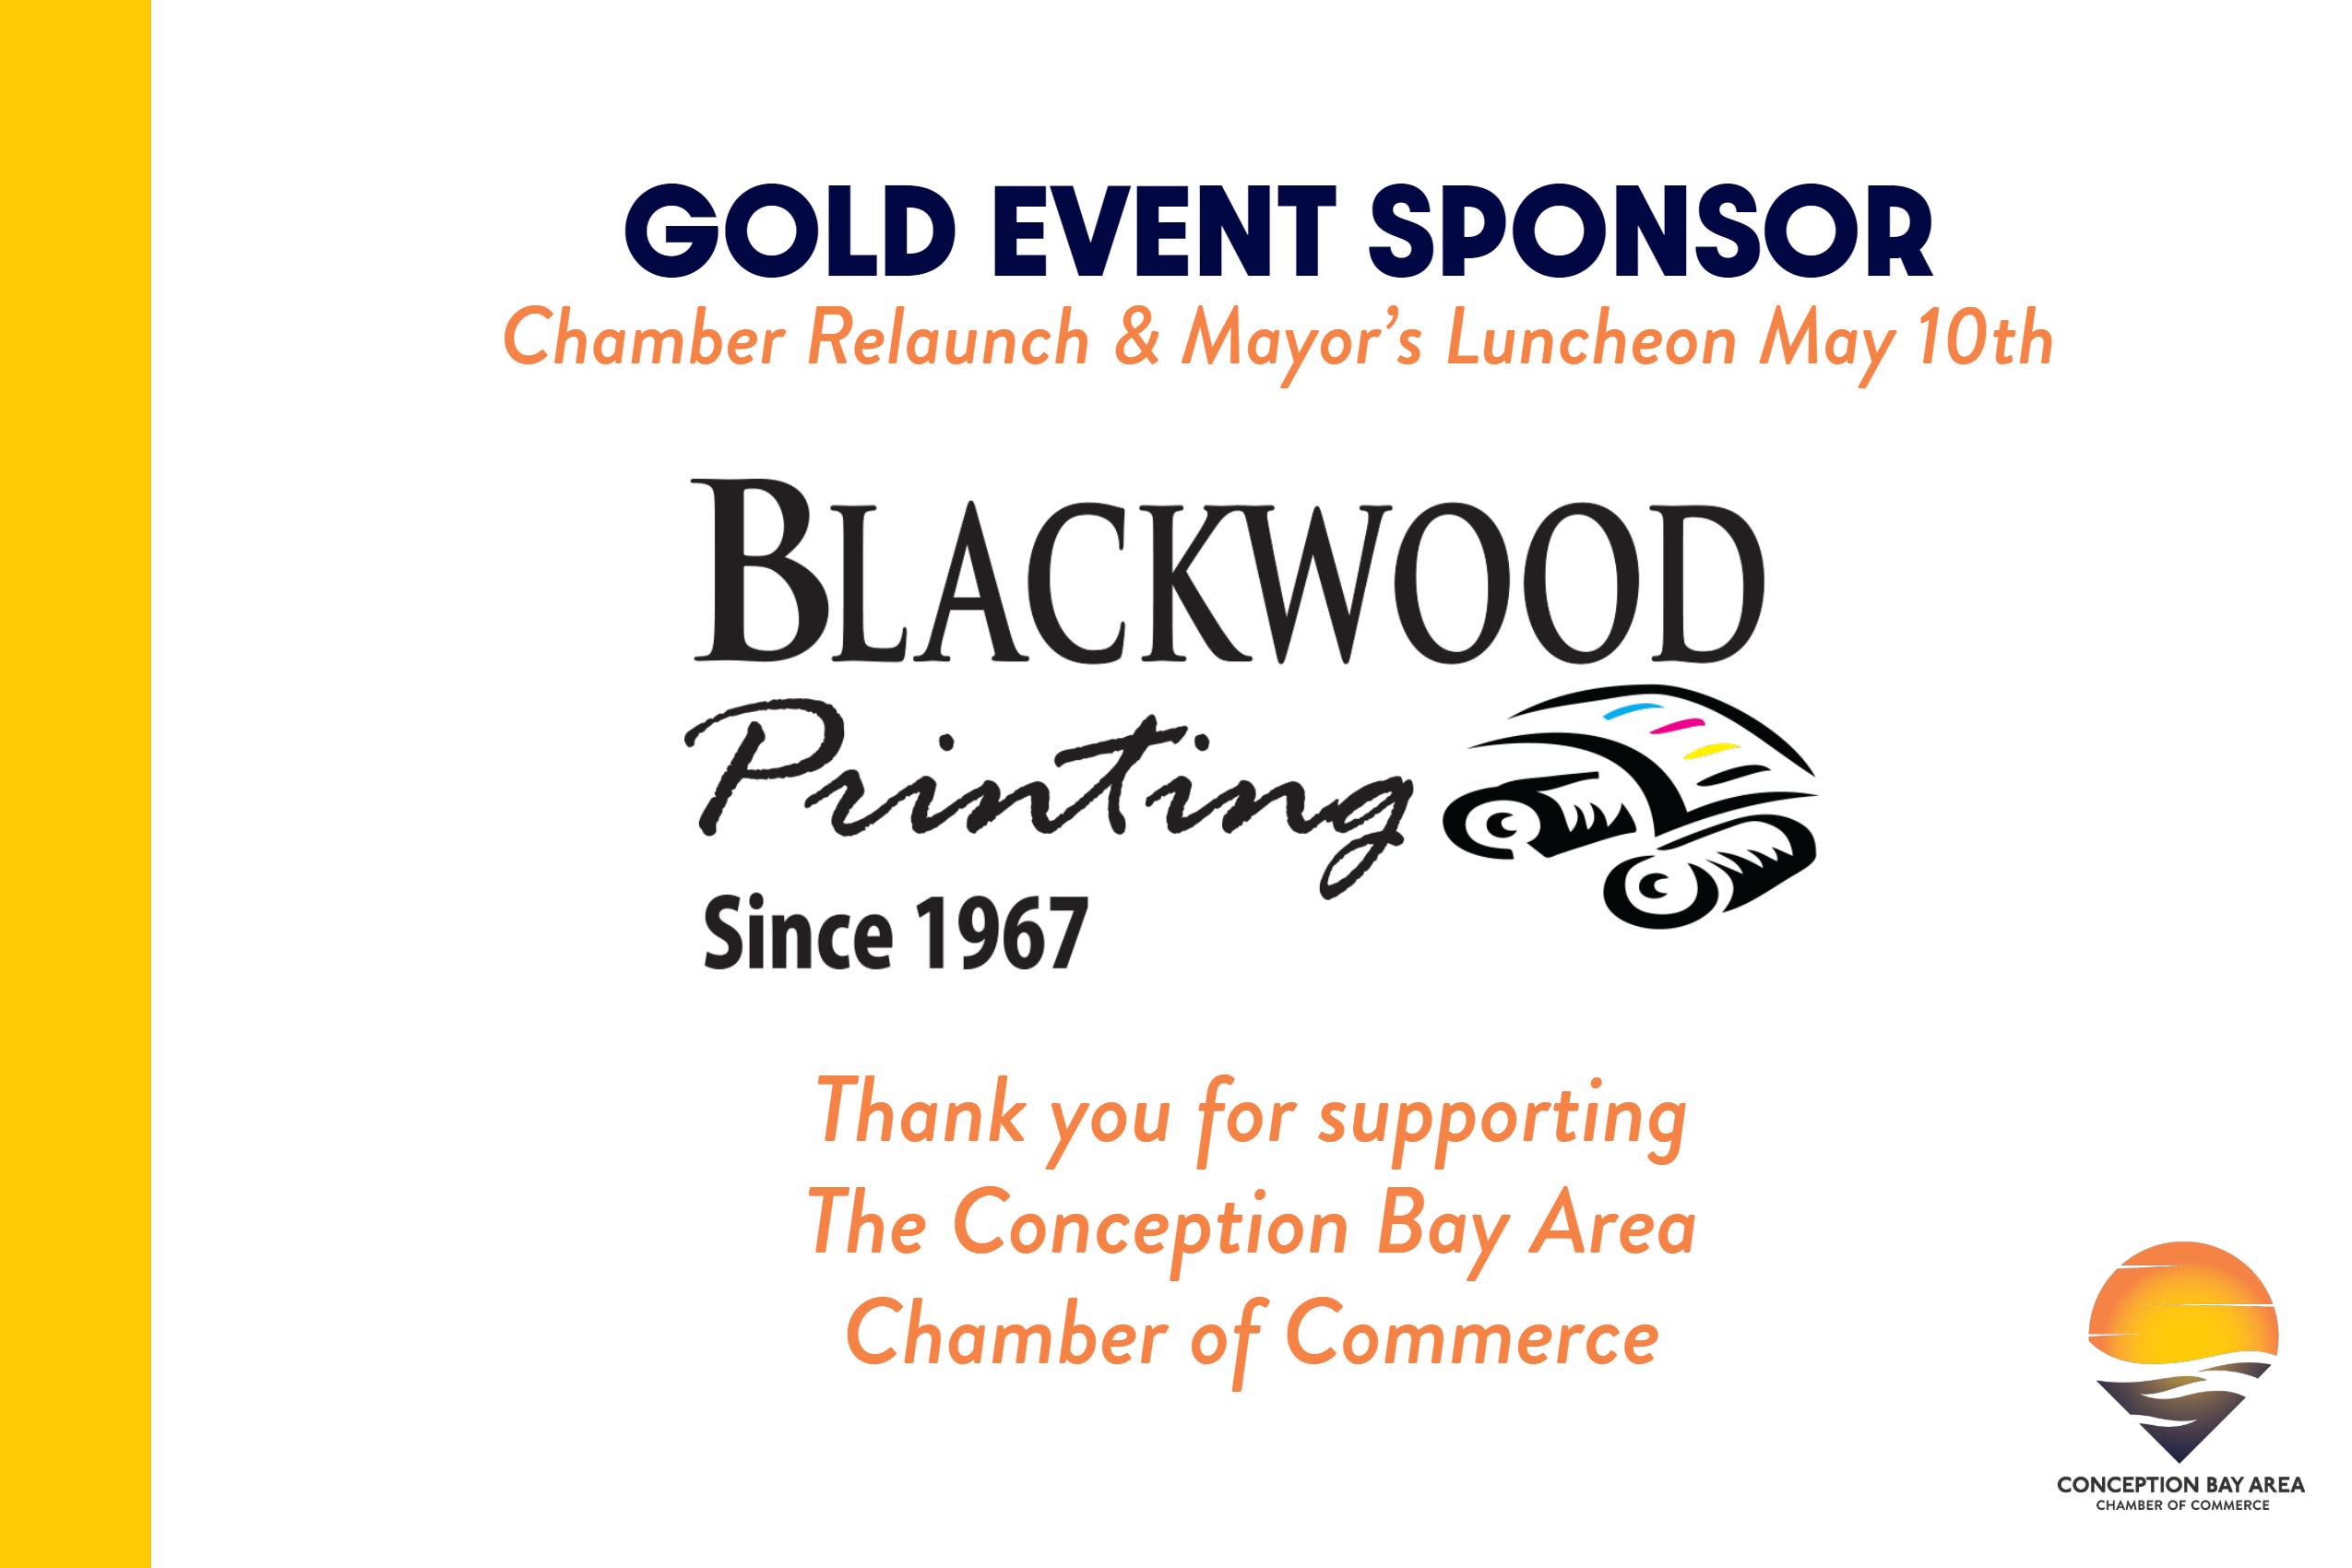 goldsponsorblackwoodprinting